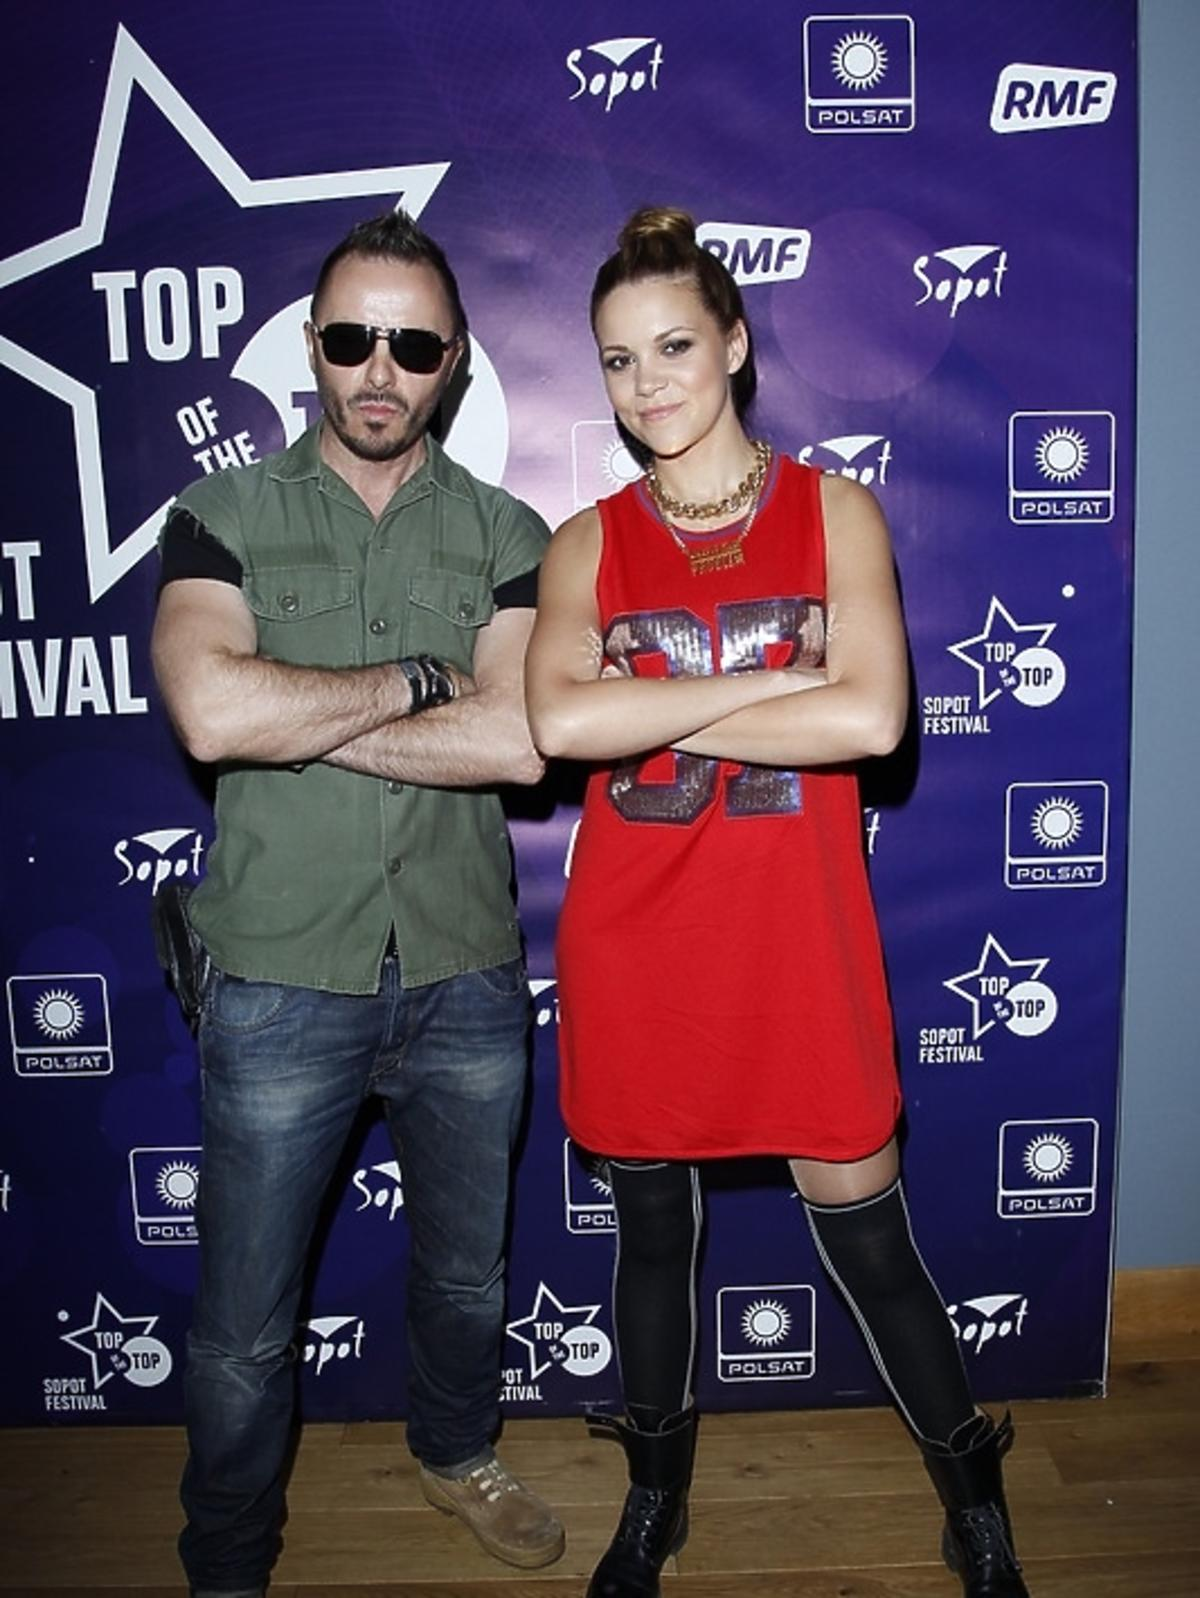 Blue Cafe podczas konferencji Sopot Top of the Top Festival 2013